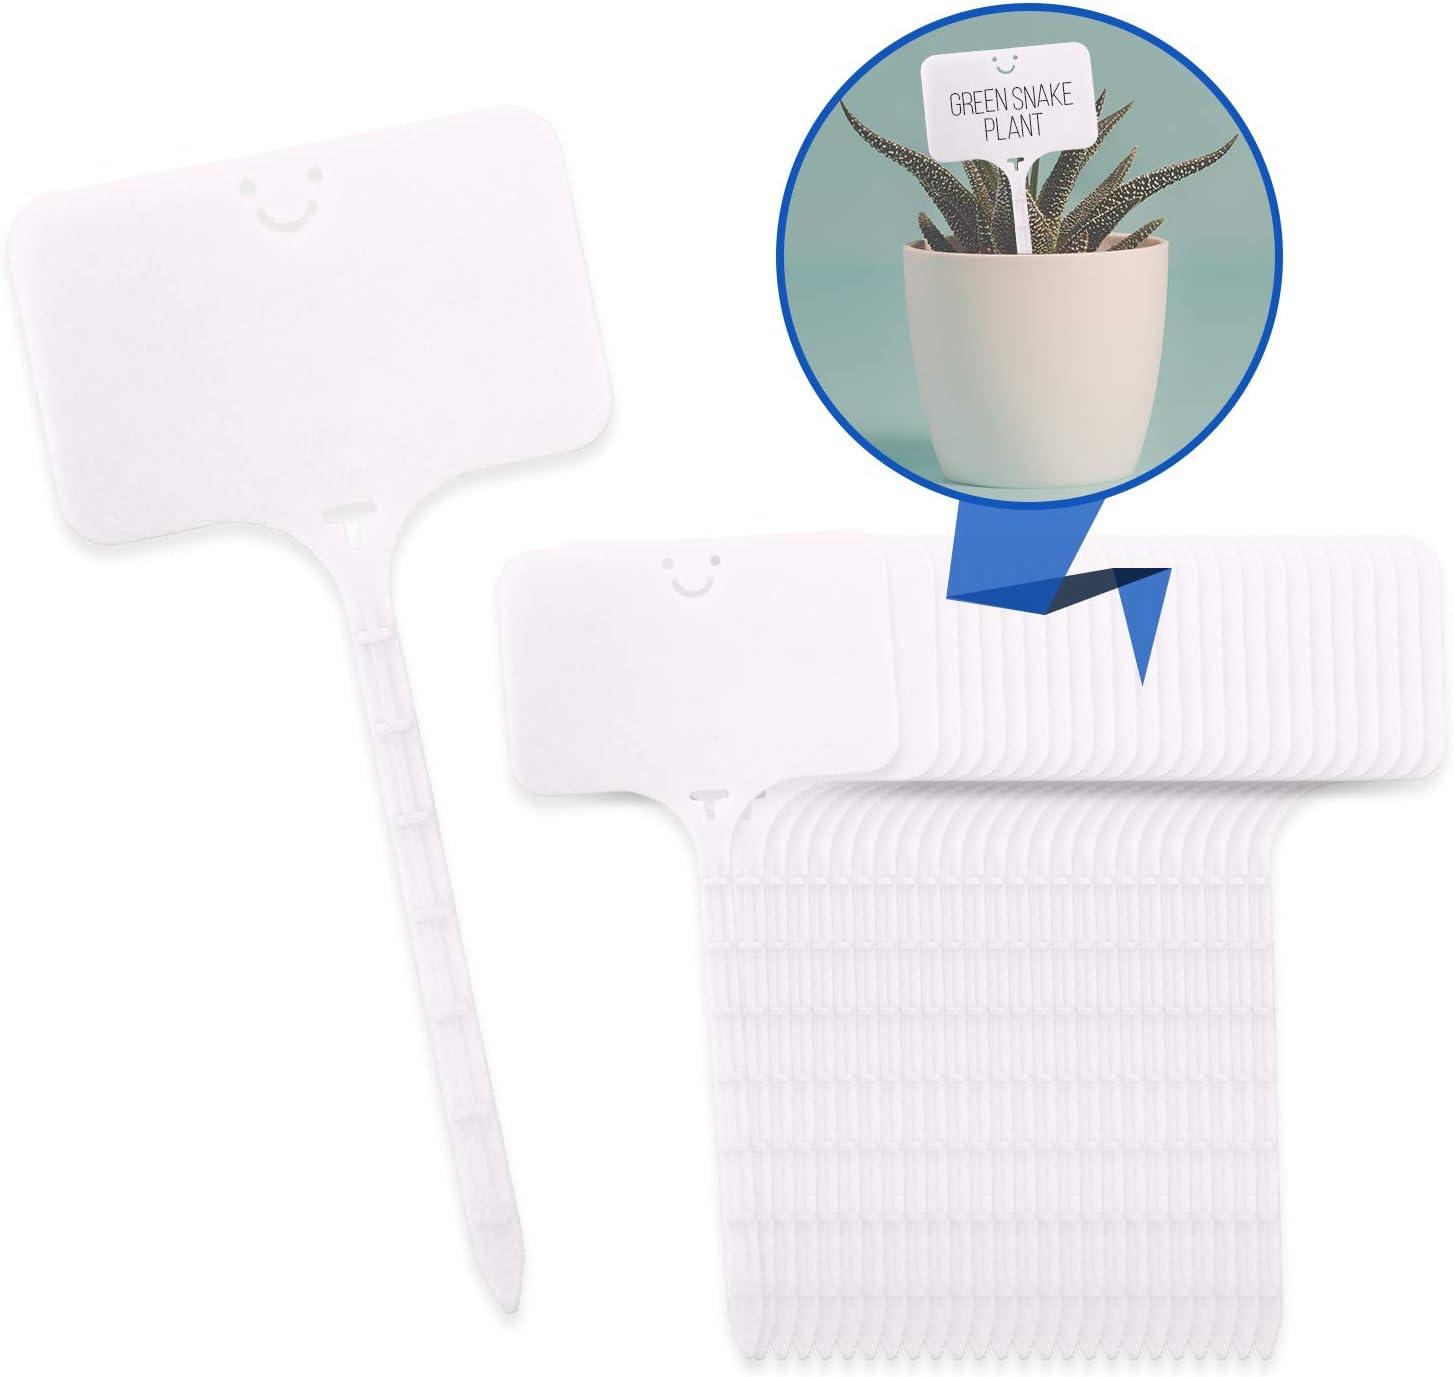 Pratico Outdoors Plastic Plant Labels - White - 25 Pack